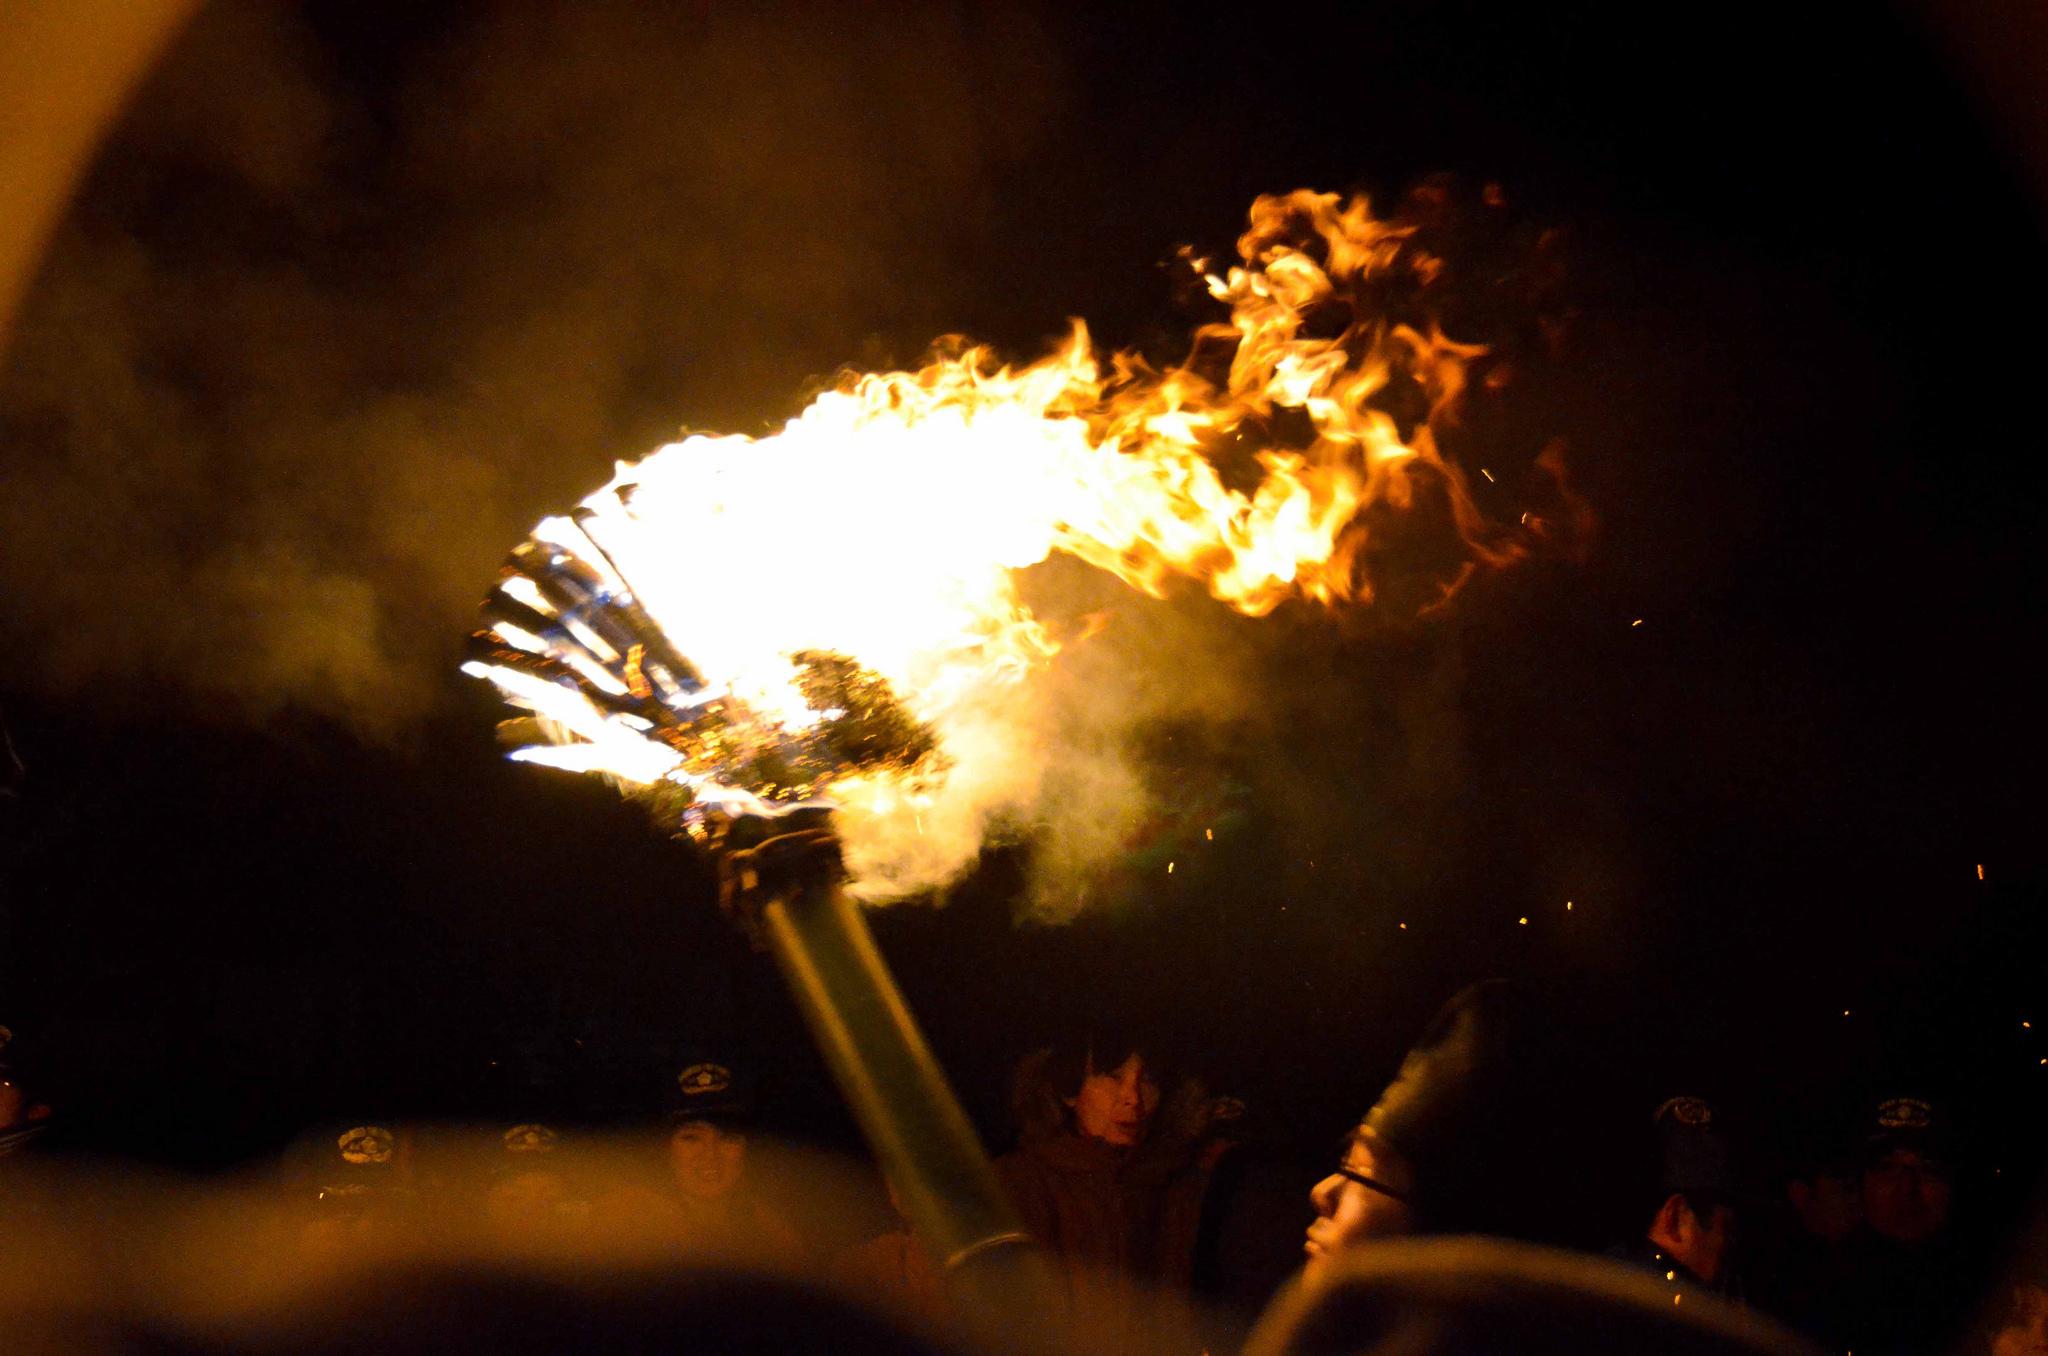 Oni Hashiri – Ogres and Flaming Torches